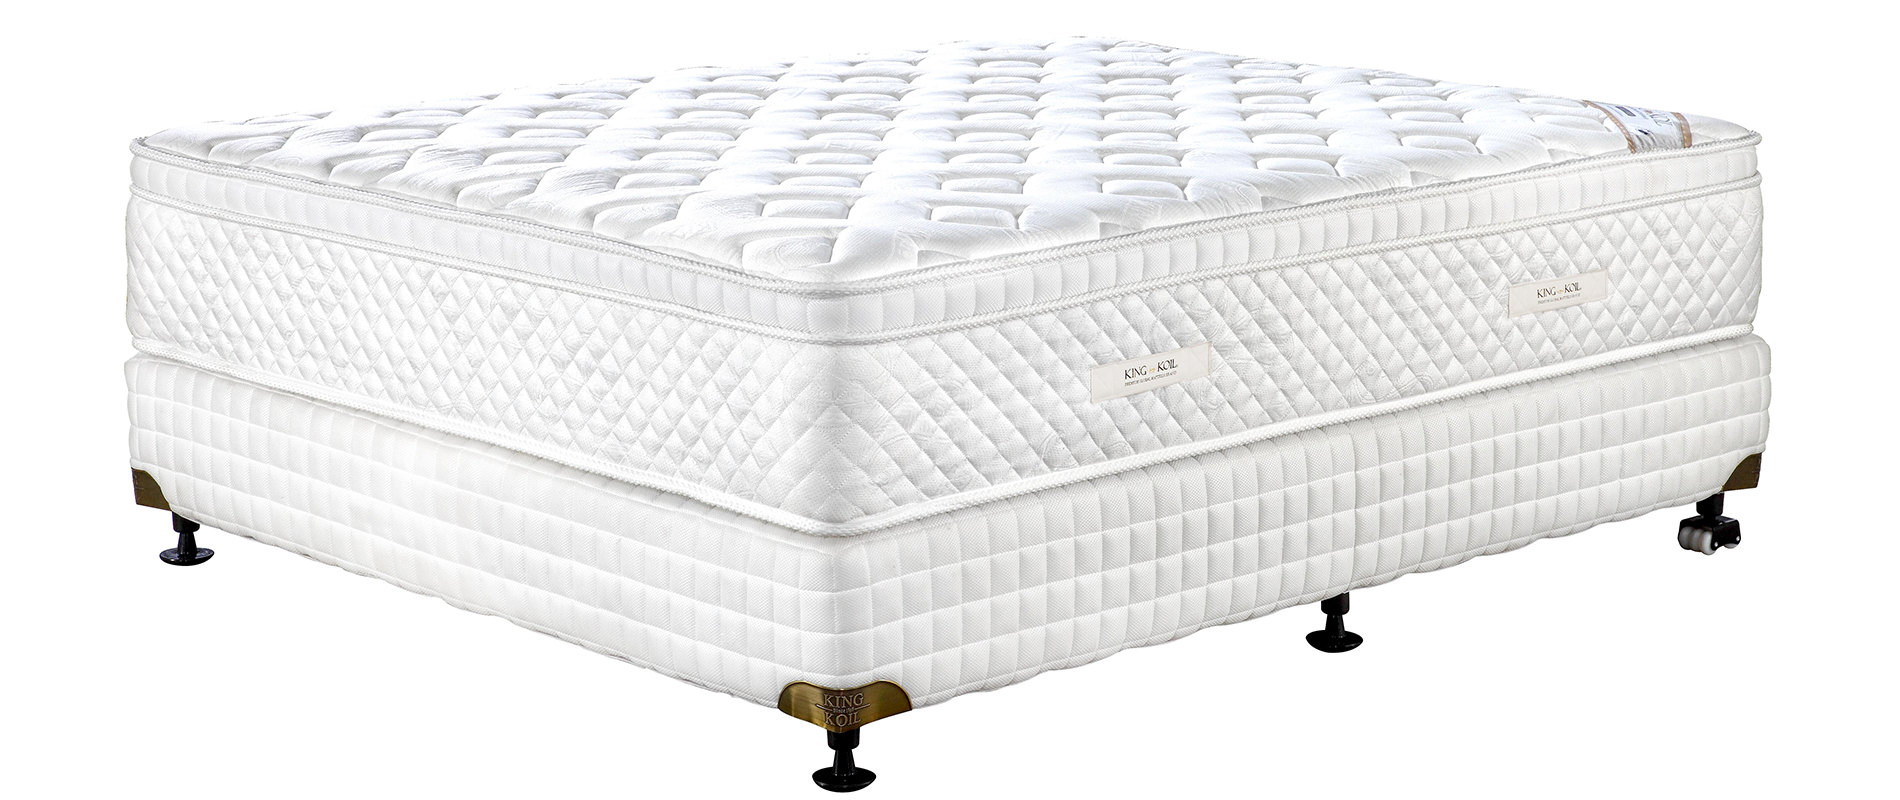 soft hotel mattress